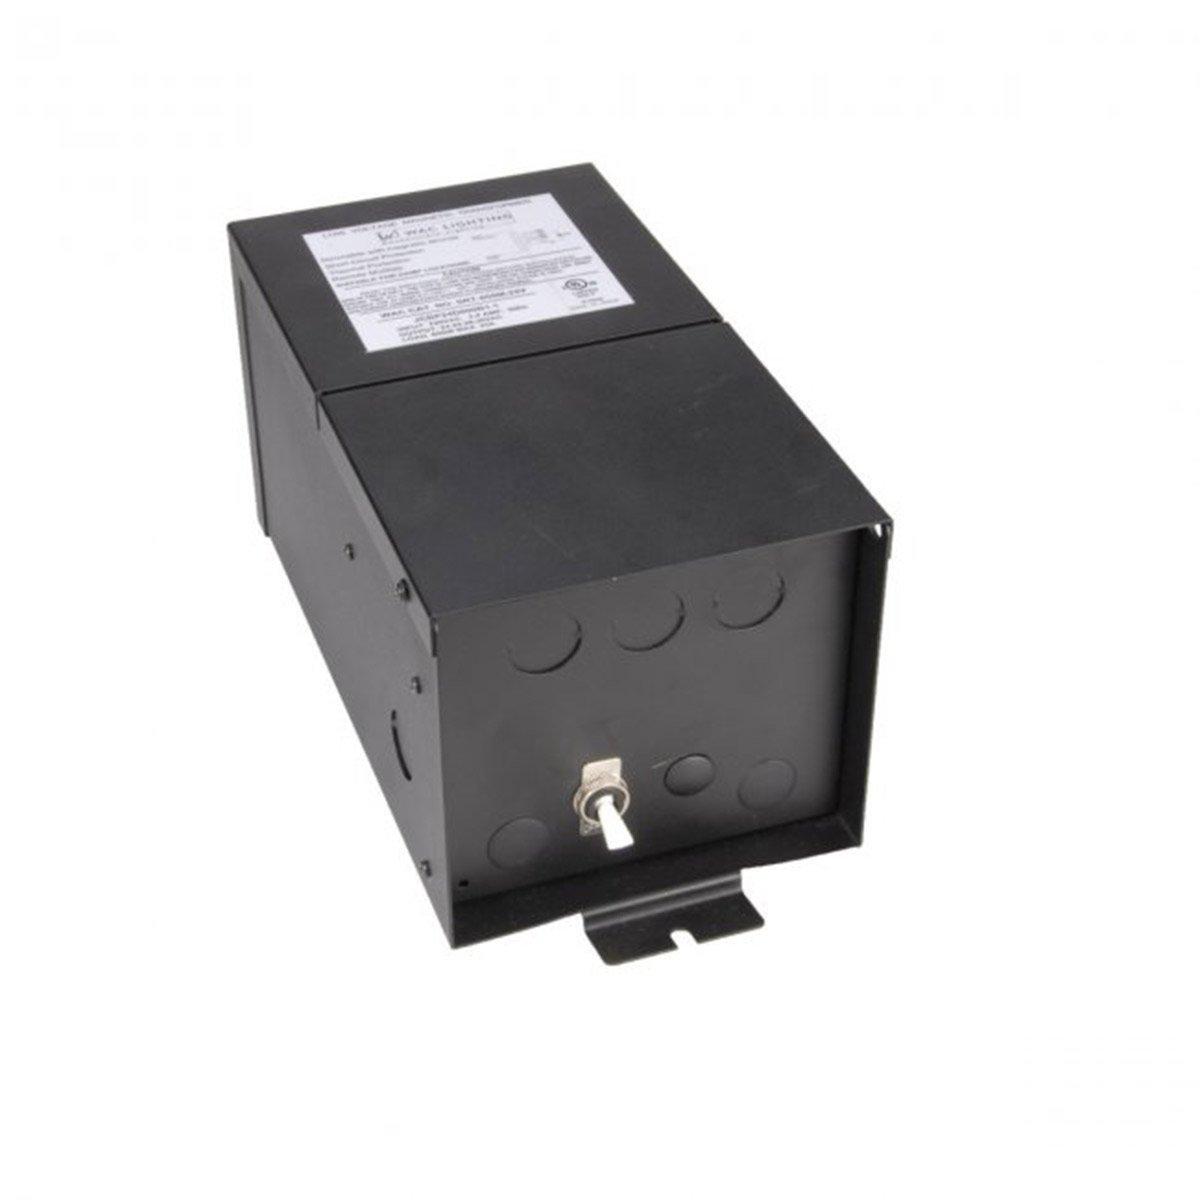 WAC Lighting SRT600M12V Remote Magnetic Transformer 600W, 600W Output 12V with Boost Tap